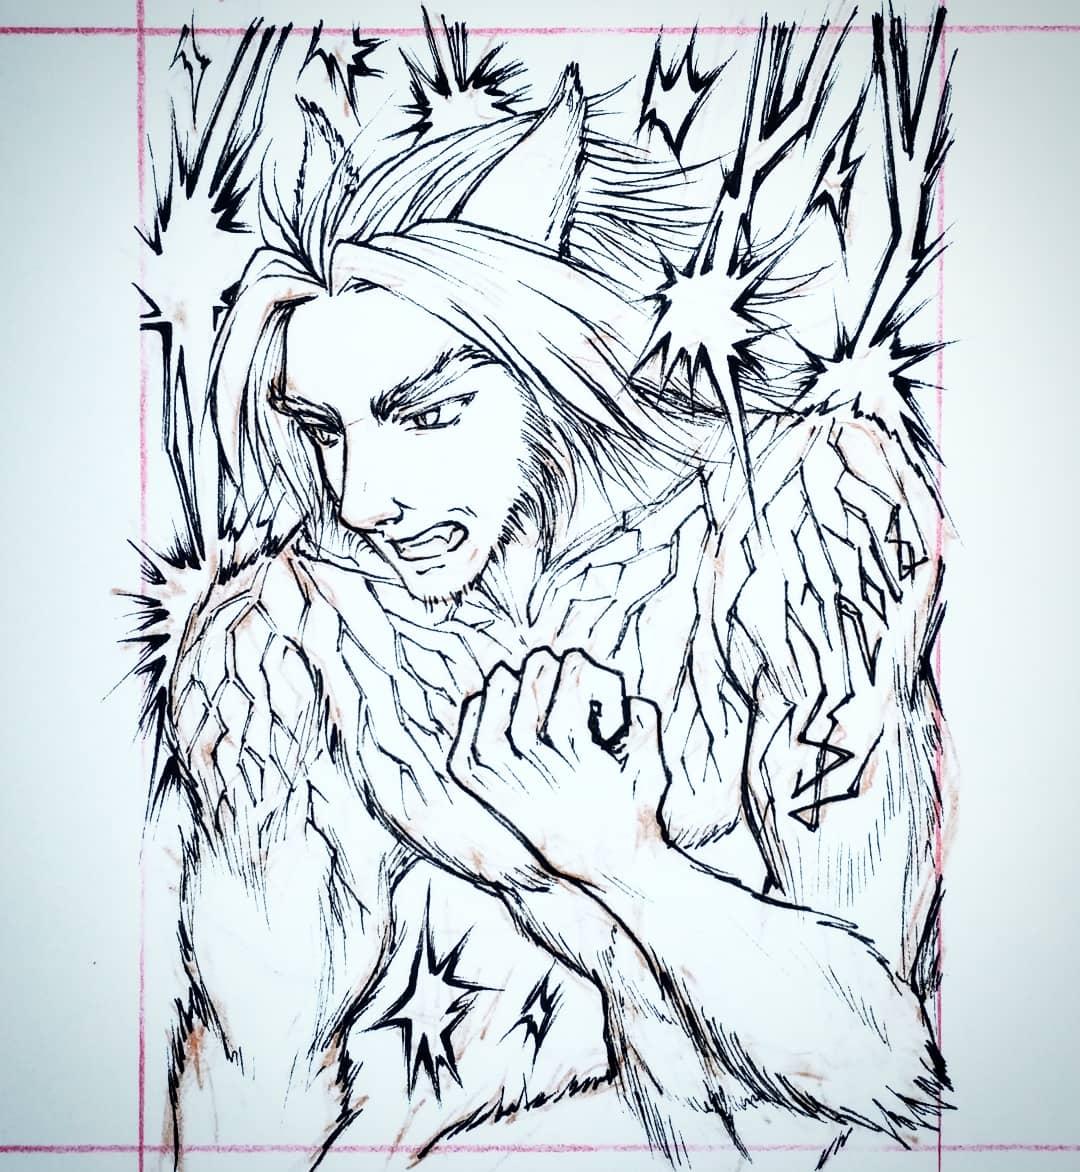 Sonia Leong Ar Twitter Day27 Inktober Thunder Inktober The Japanese God Of Thunder Raiju Is Often Represented By A Blue White Wolf Inktober2018 Art Drawing Illustration Inking Inktoberday27 Inktober2018day27 Inktoberthunder Contact saova drawing on messenger. twitter